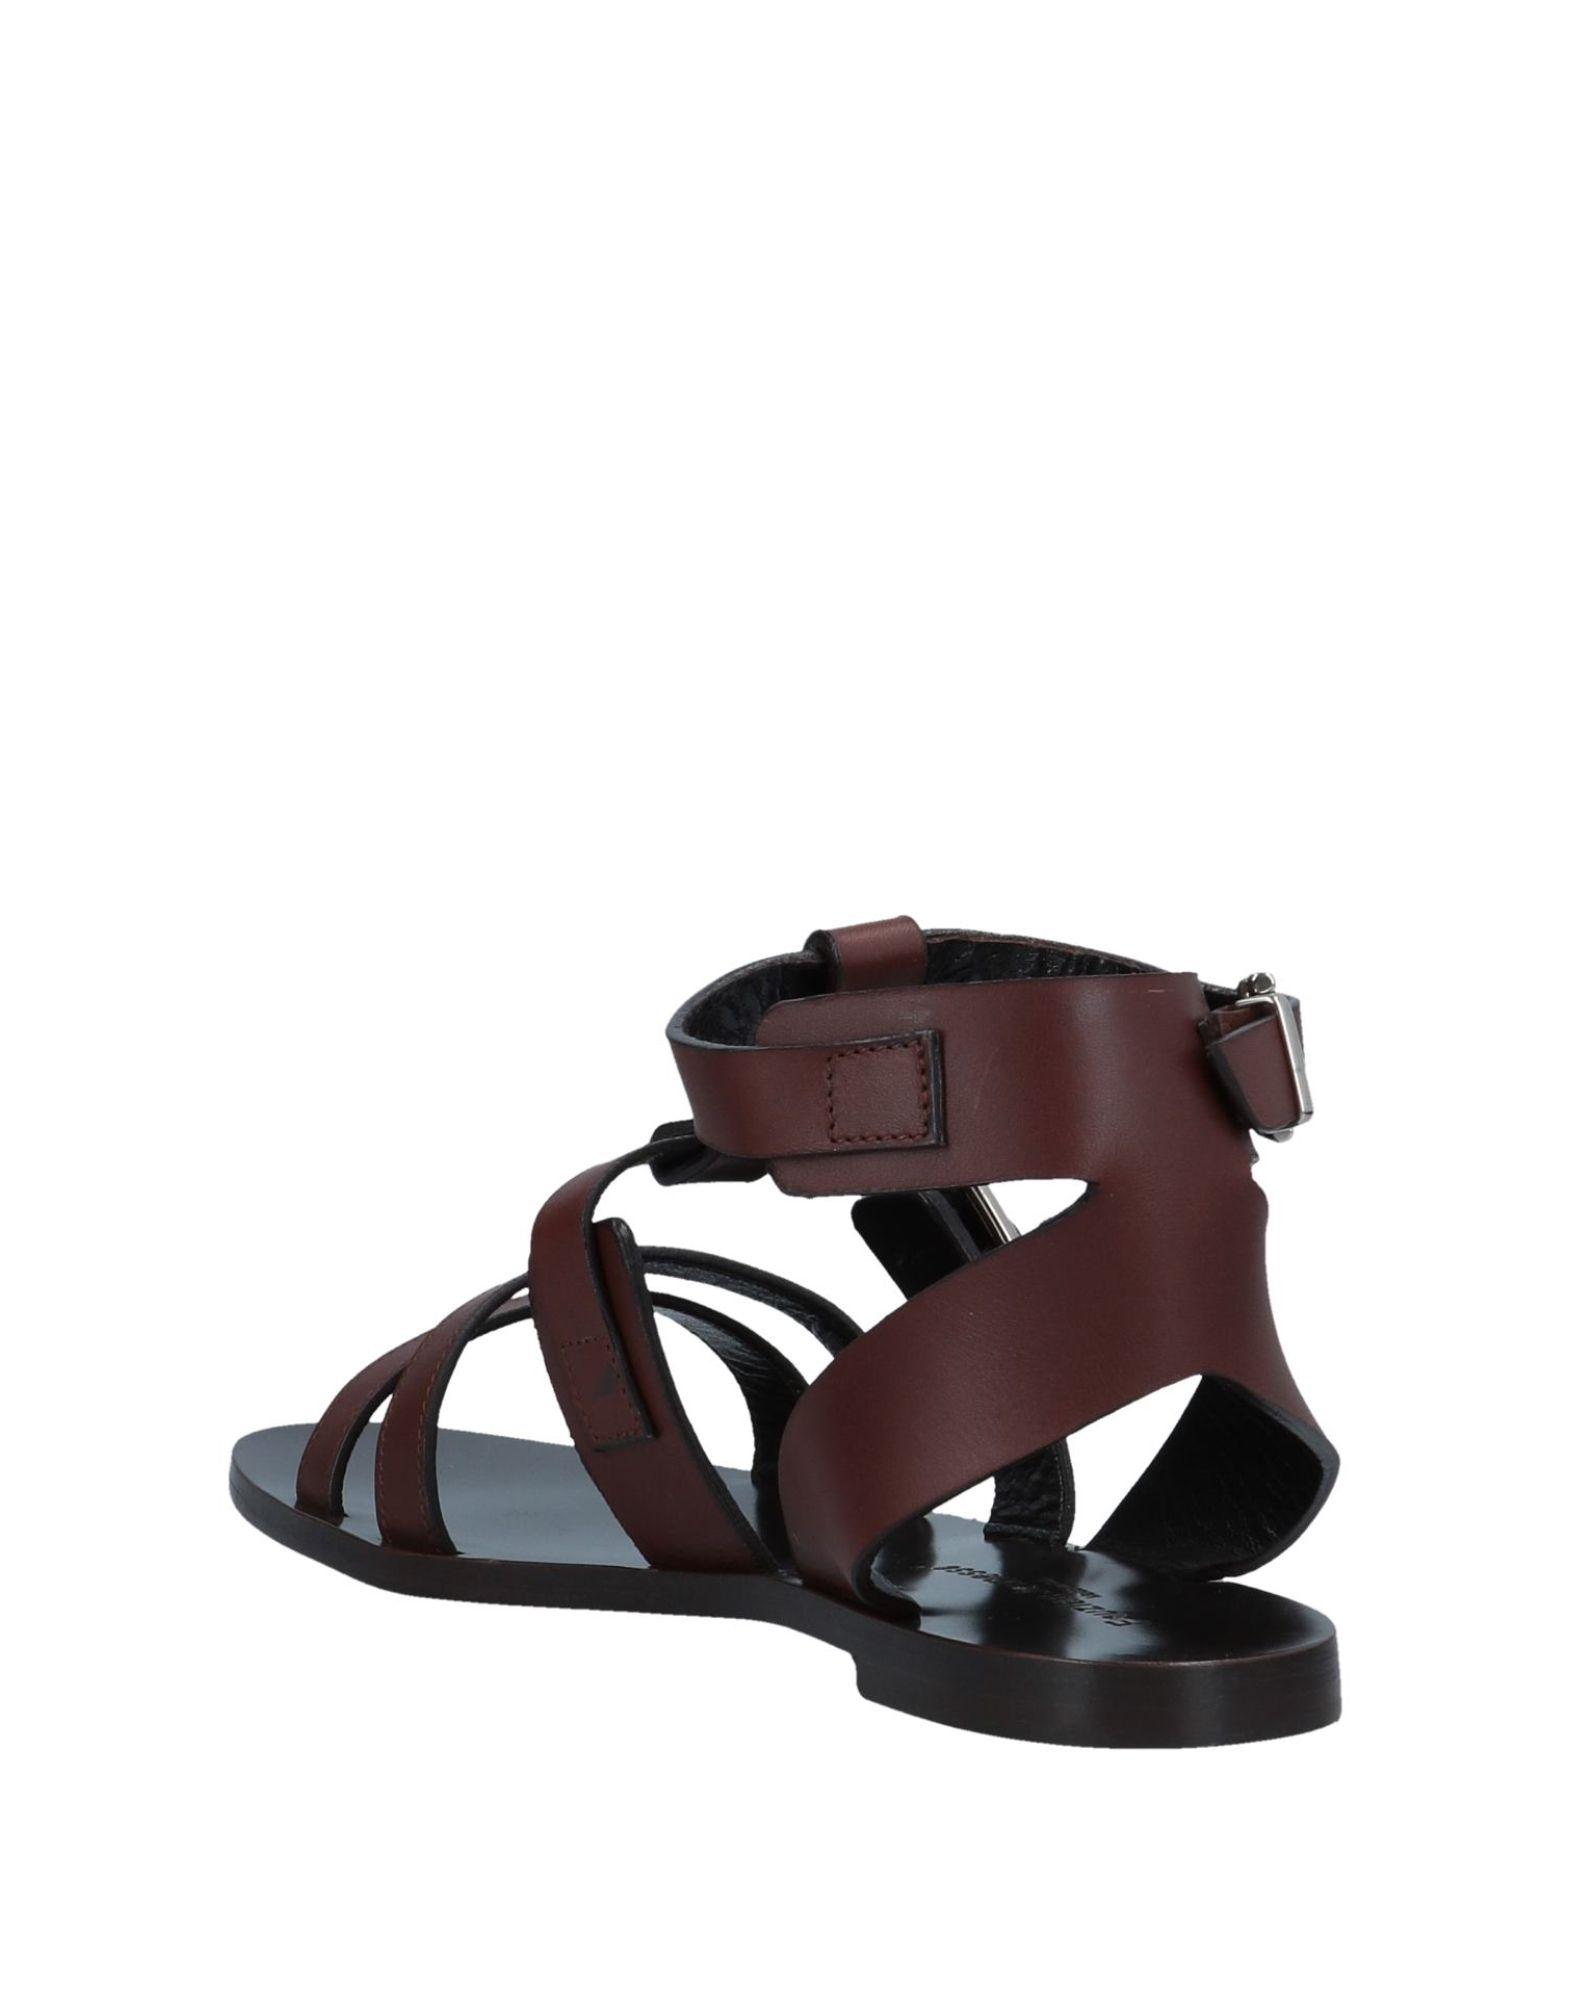 fauzian jeunesse sandales en - femmes fauzian jeunesse sandales en sandales ligne le royaume - uni - 11556922di 9d3686